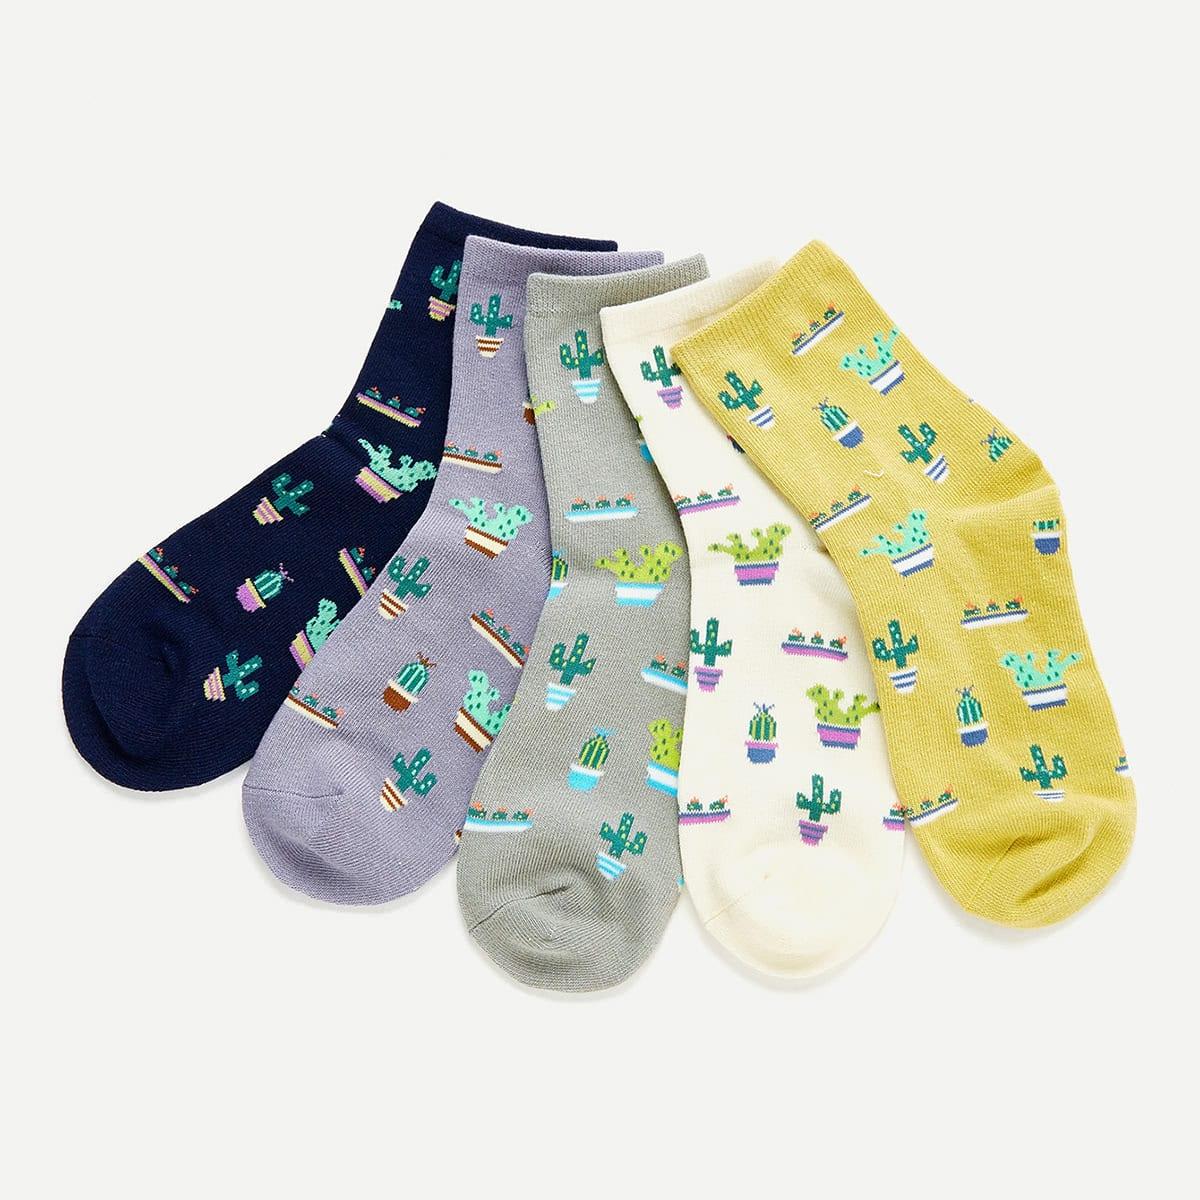 Cactus Print Ankle Socks 5pairs